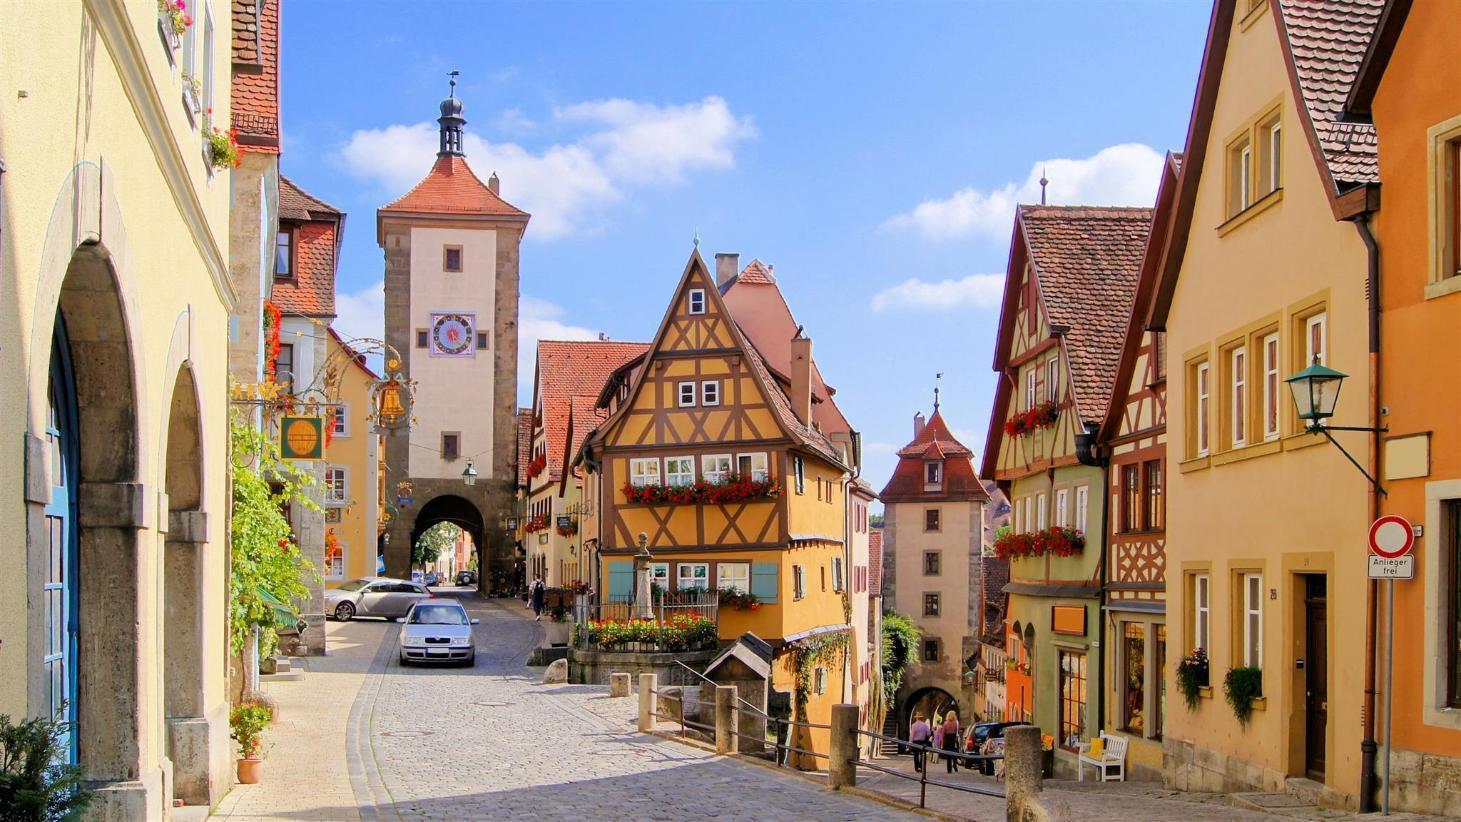 Ob tauber rothenburg der Rothenburg ob